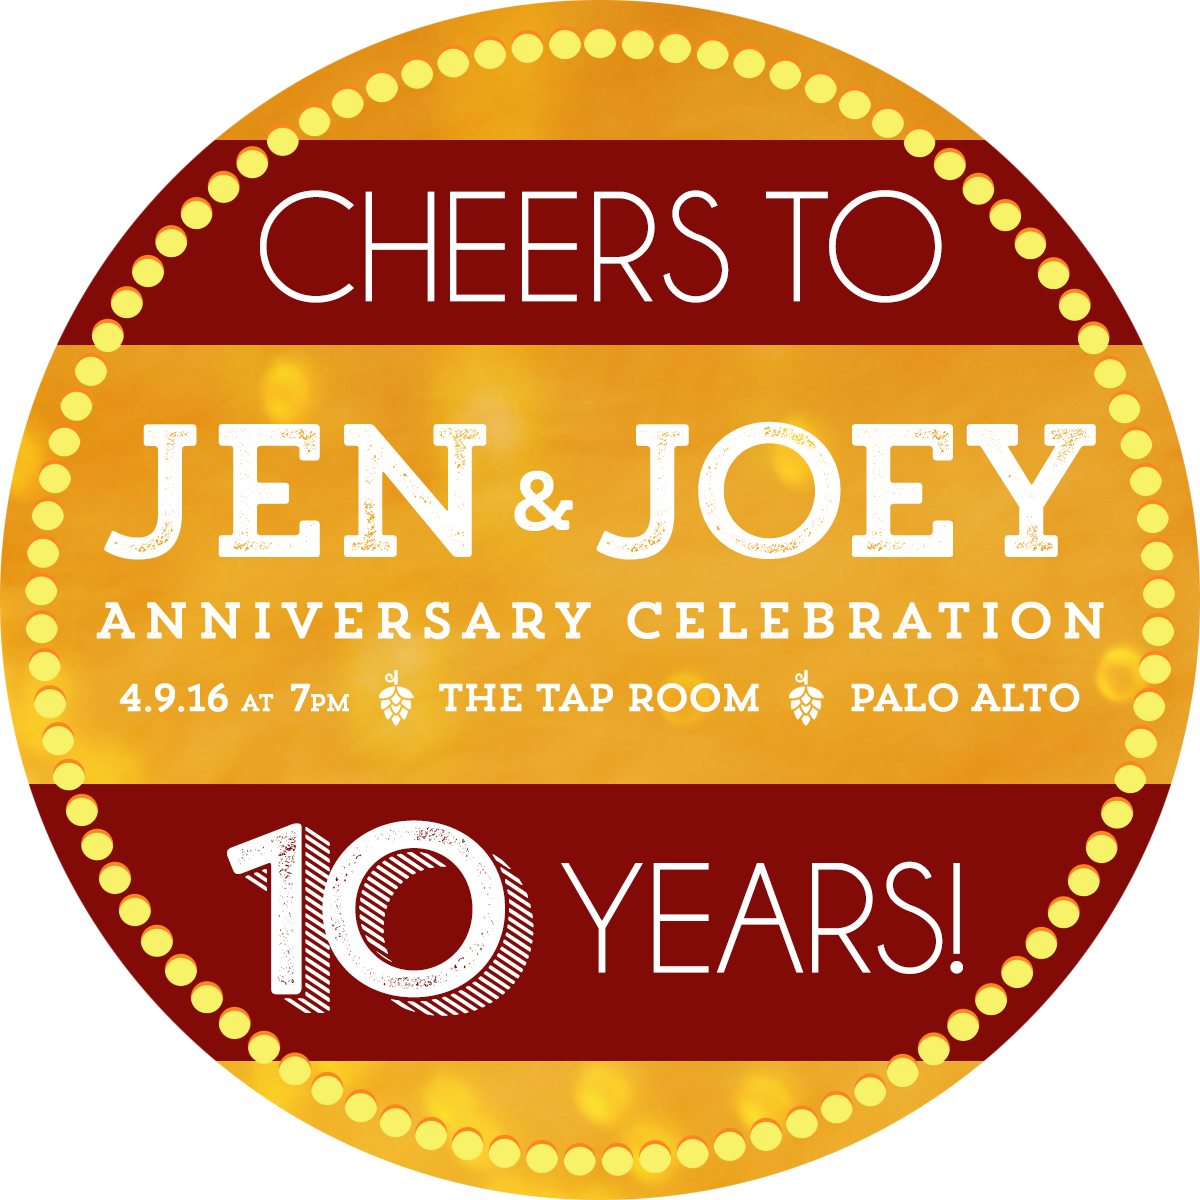 Joey McDaniel - Wedding Anniversary - Cheers 10 Years!